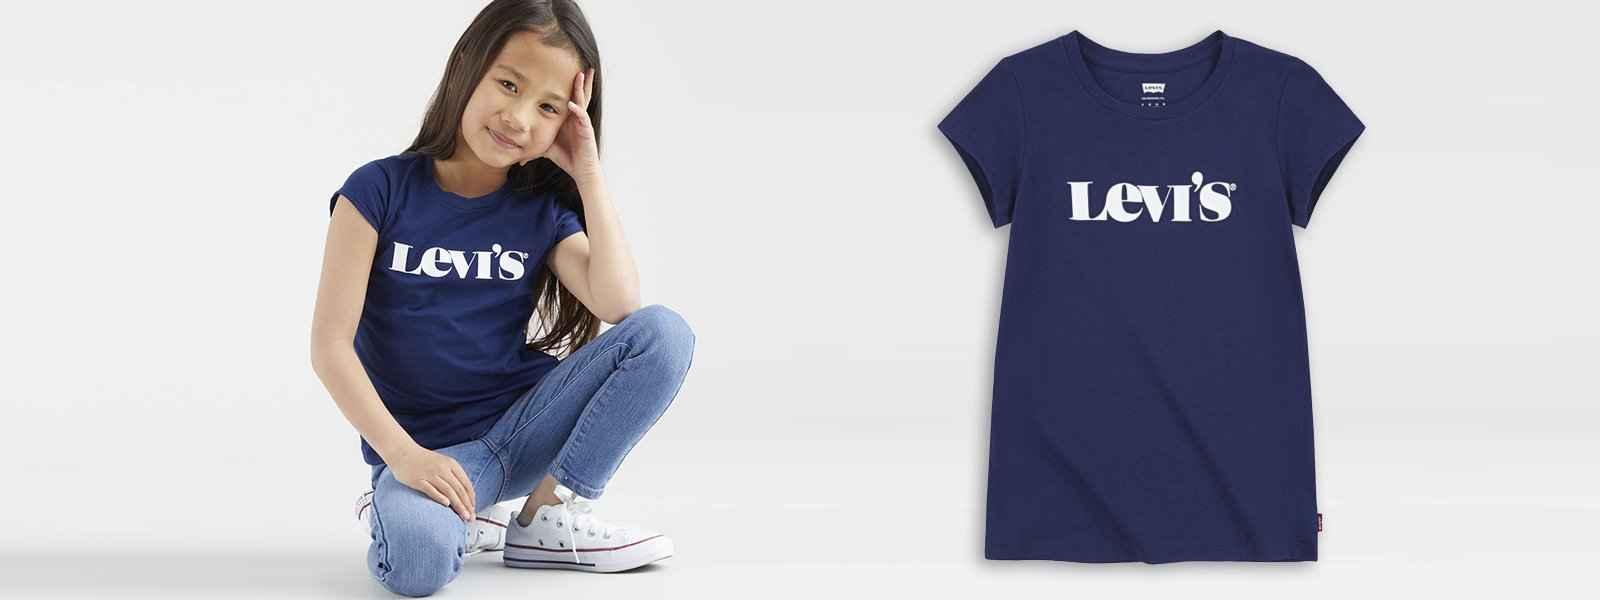 Mädchen Shirts